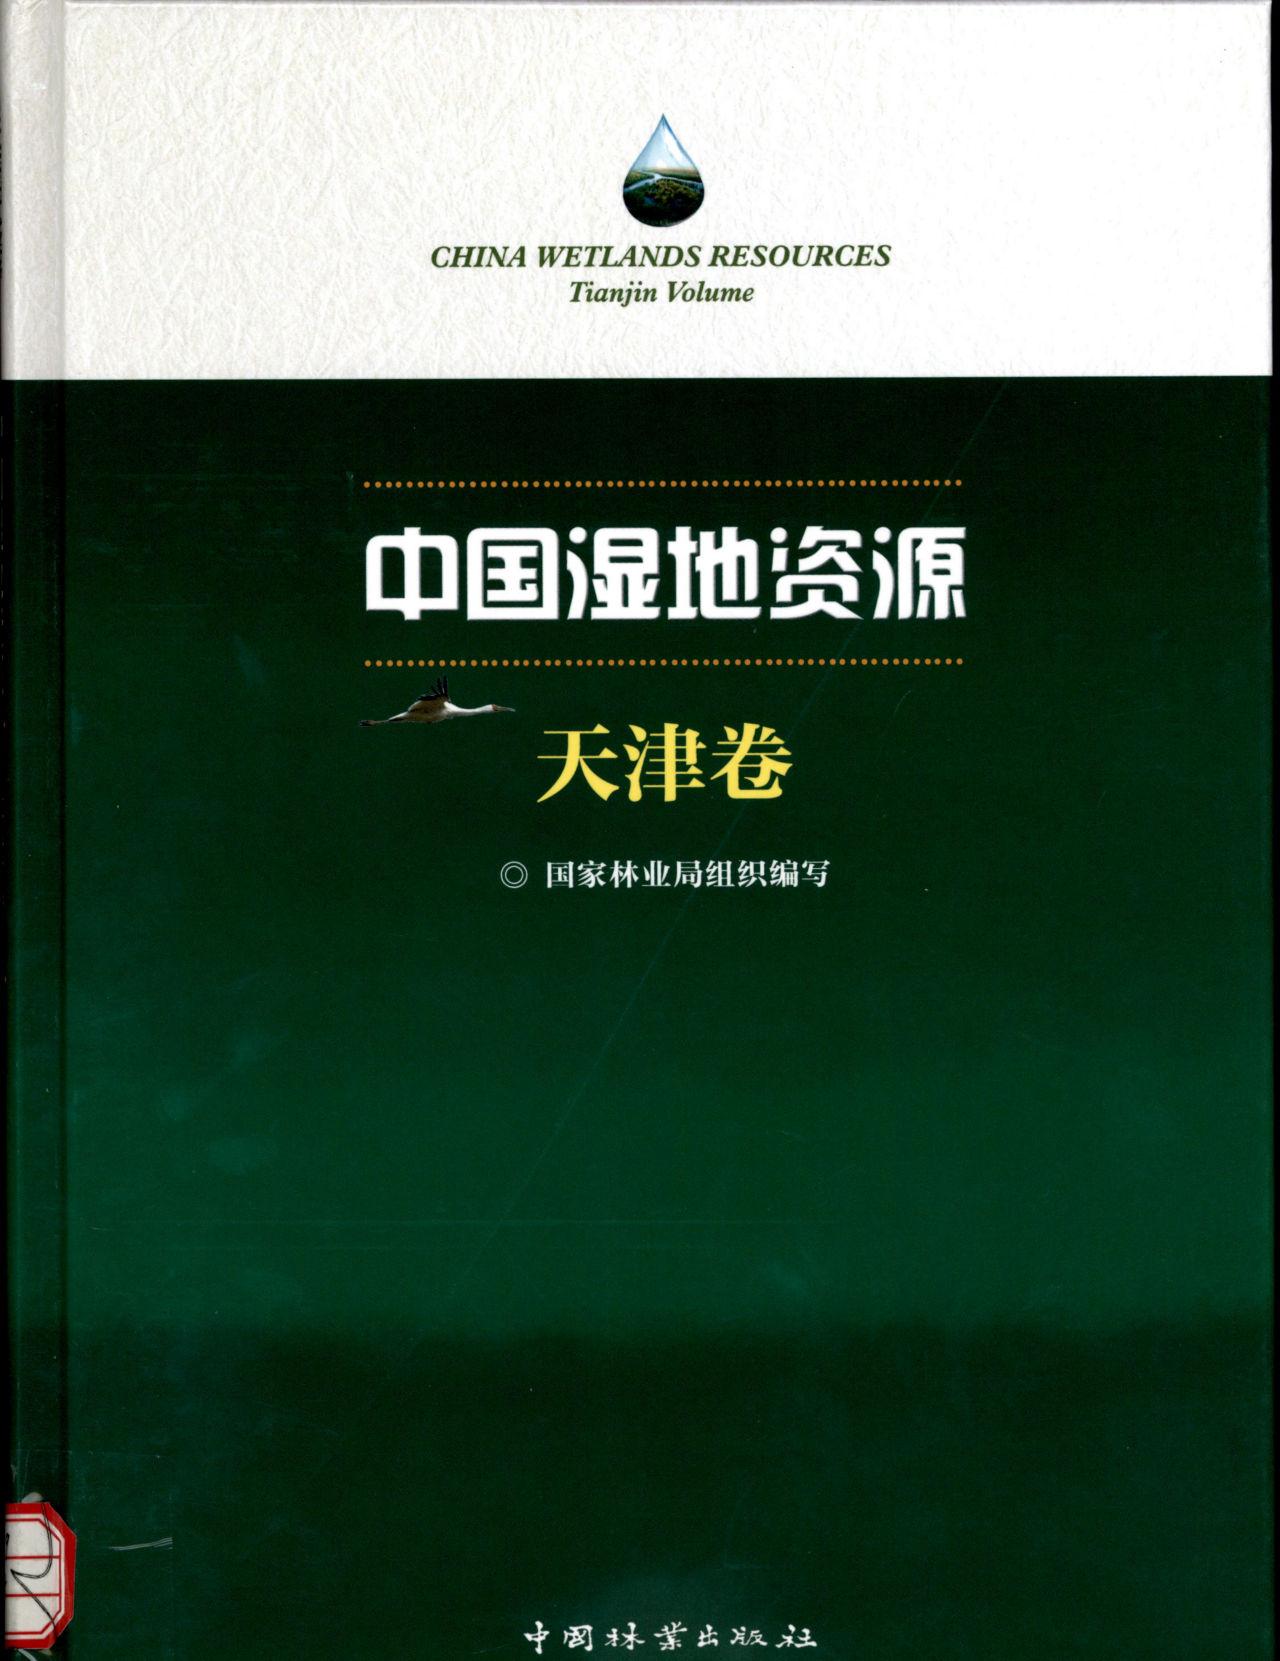 CHINA WETLANDS RESOURCES Tianjin Volume 中国湿地资源 天津卷